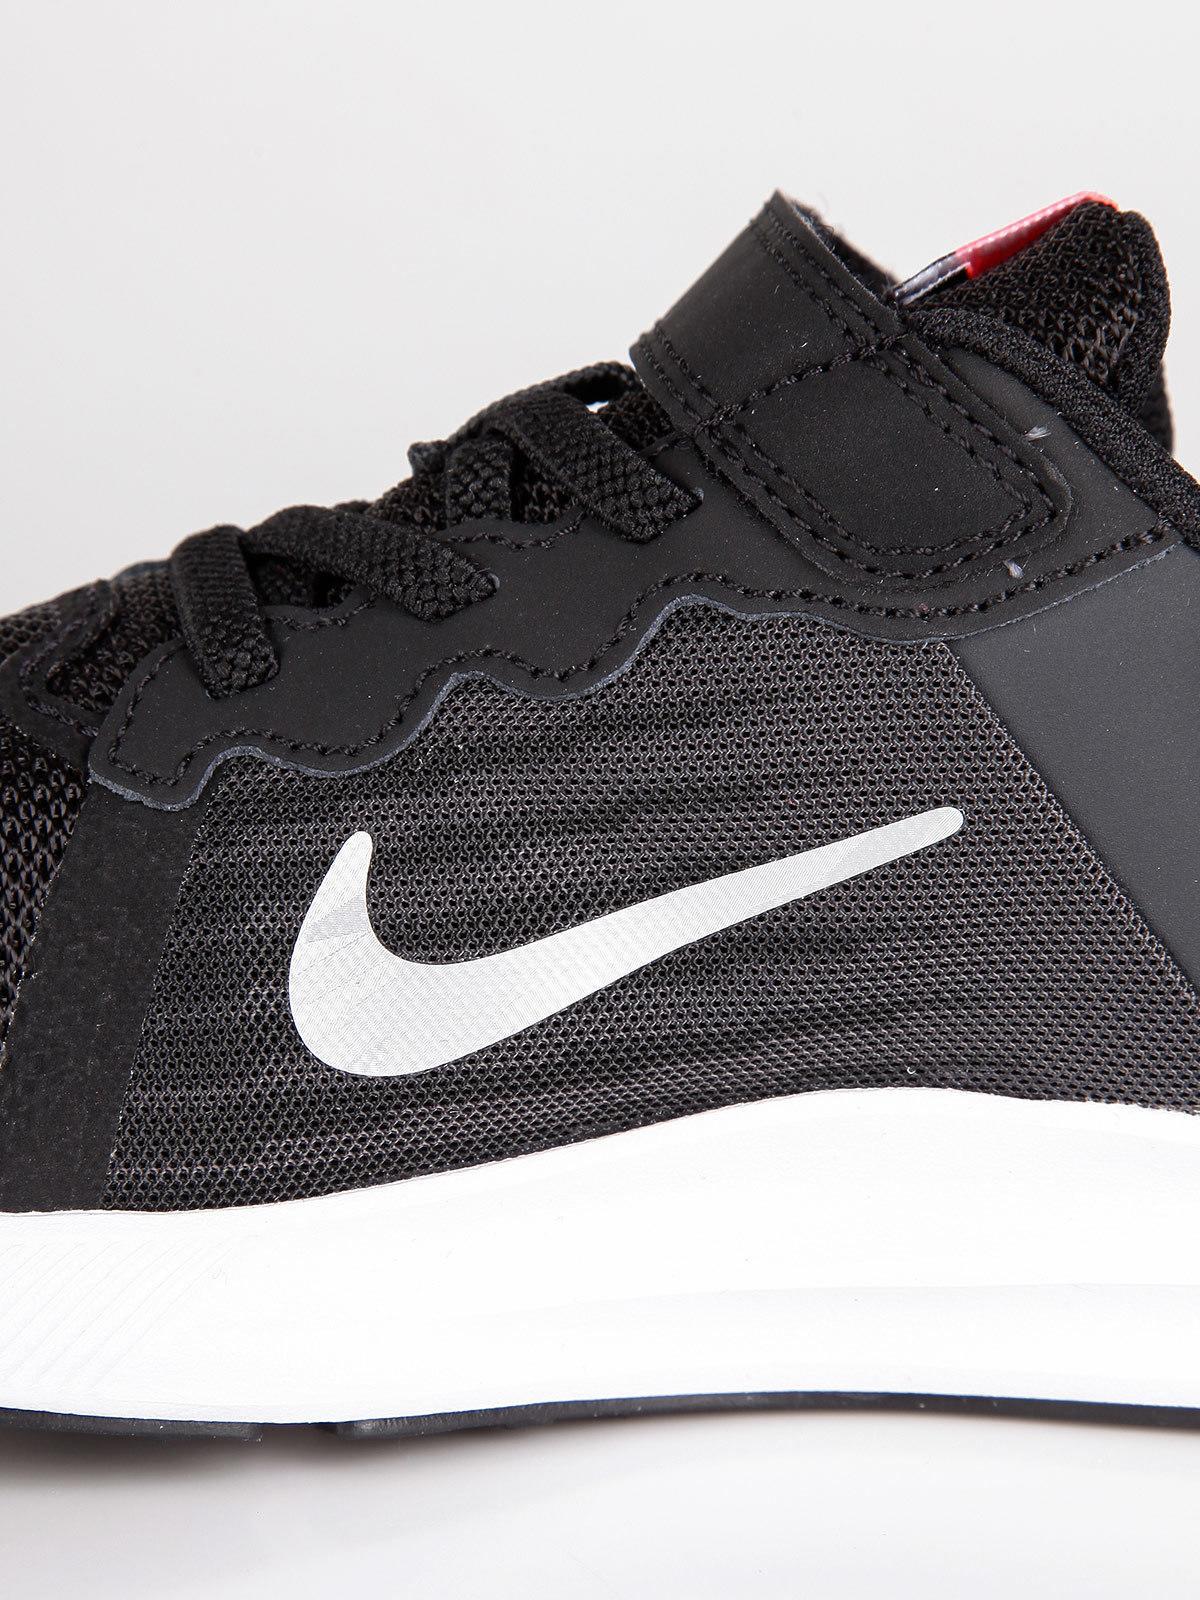 Nike Downshifter 8 Chica Zapatillas running mujer negro